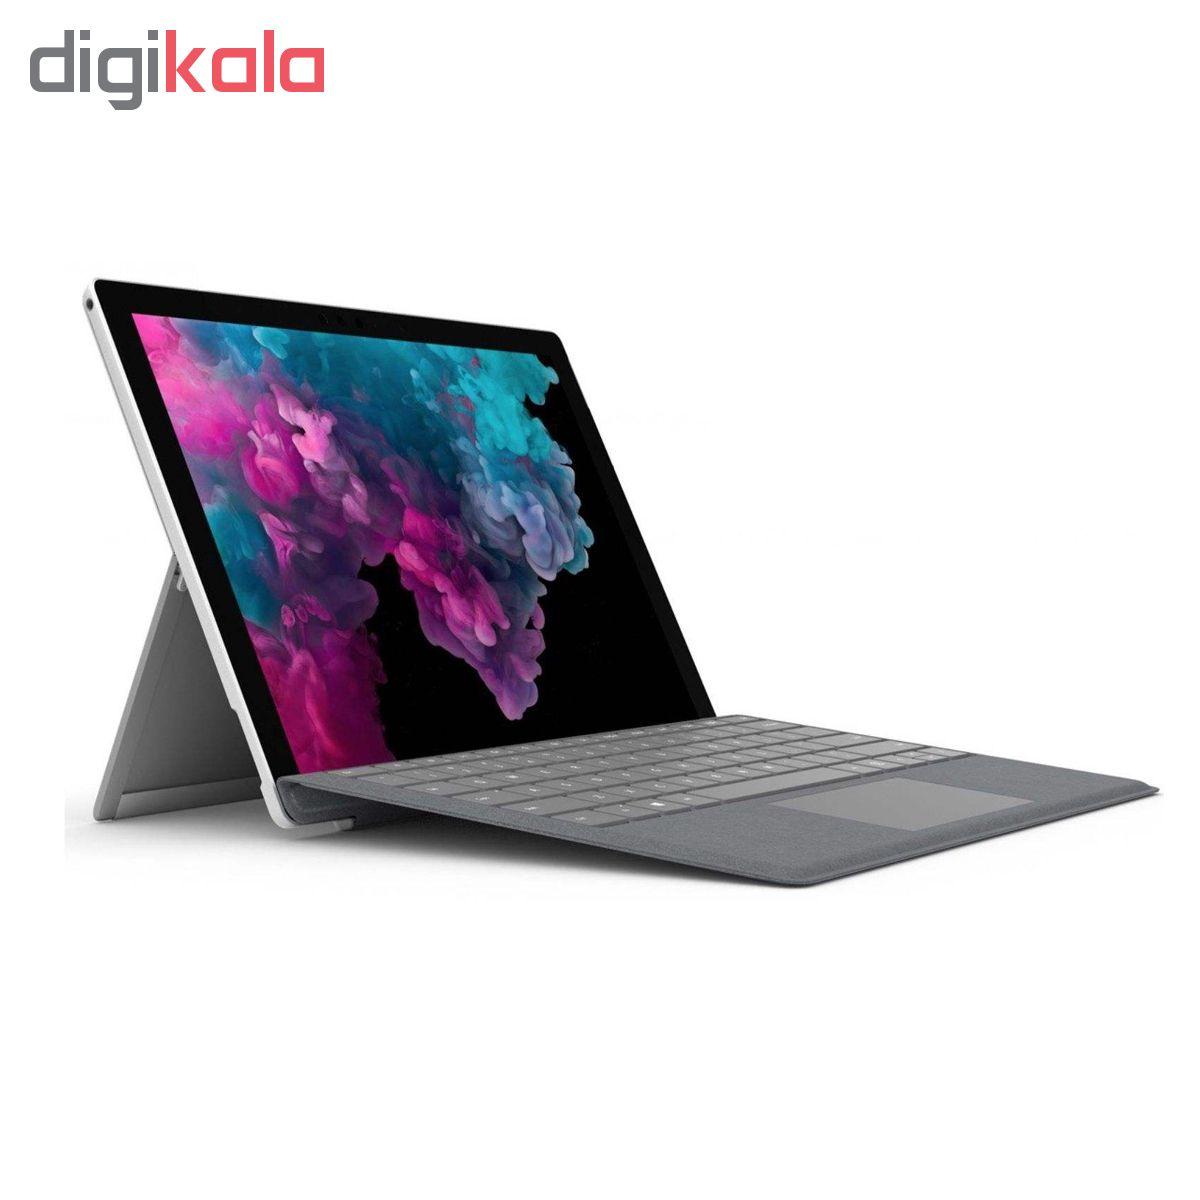 تبلت مایکروسافت مدل Surface Pro 6 - LQ6 به همراه کیبورد TYPE COVER و قلم main 1 3